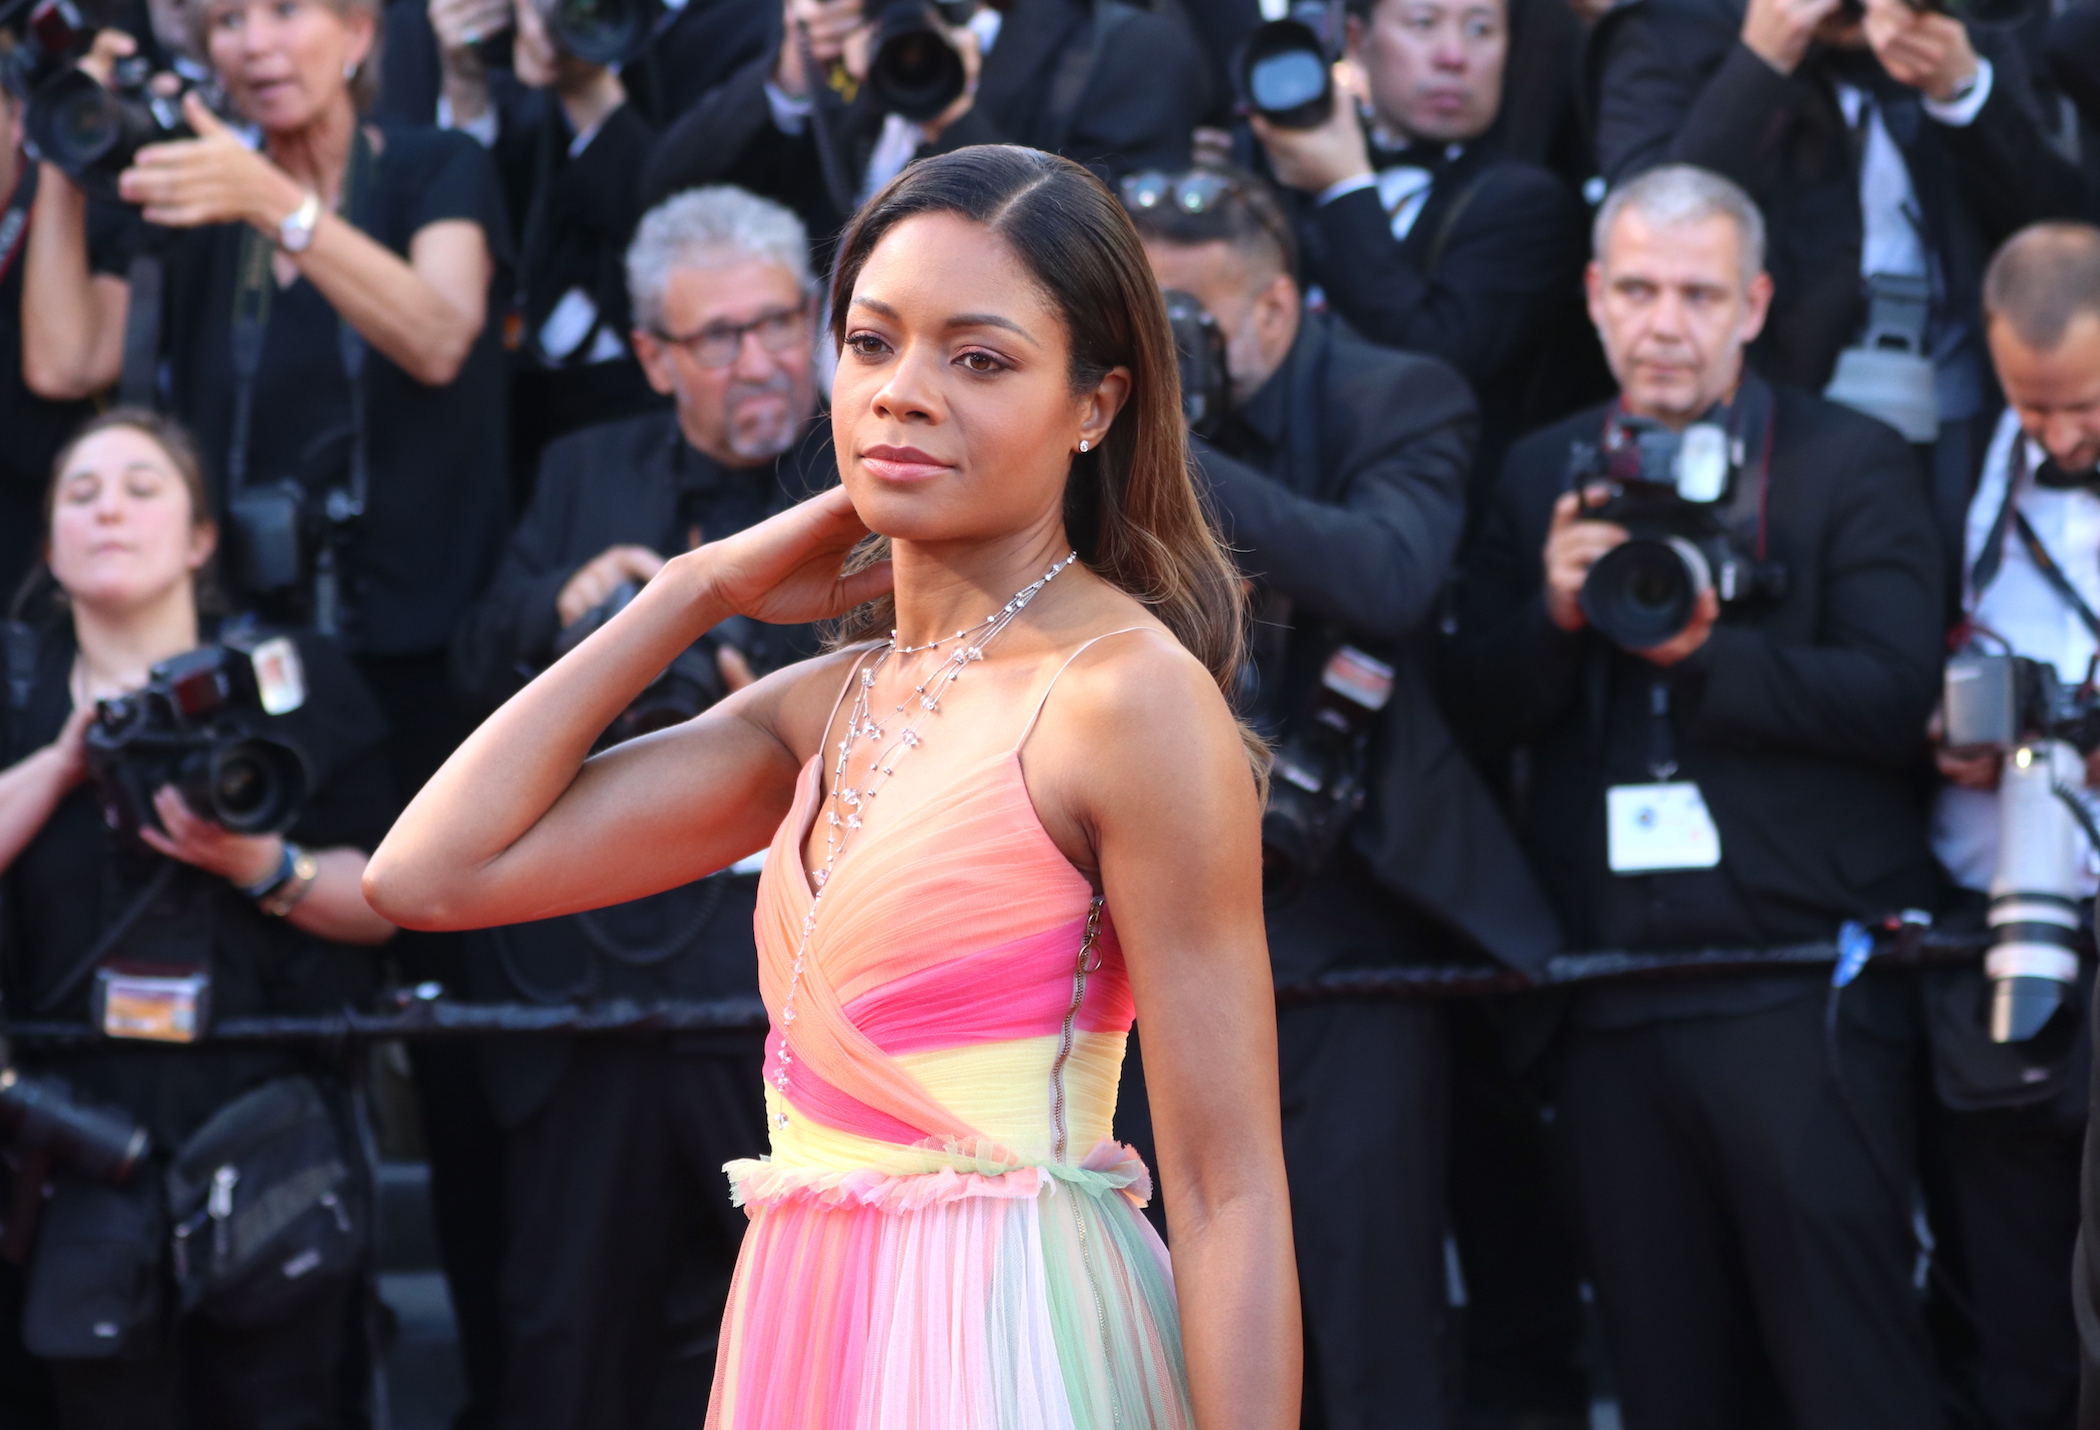 Cannes 2017: la bellissima Naomie Harris sul red carpet inaugurale